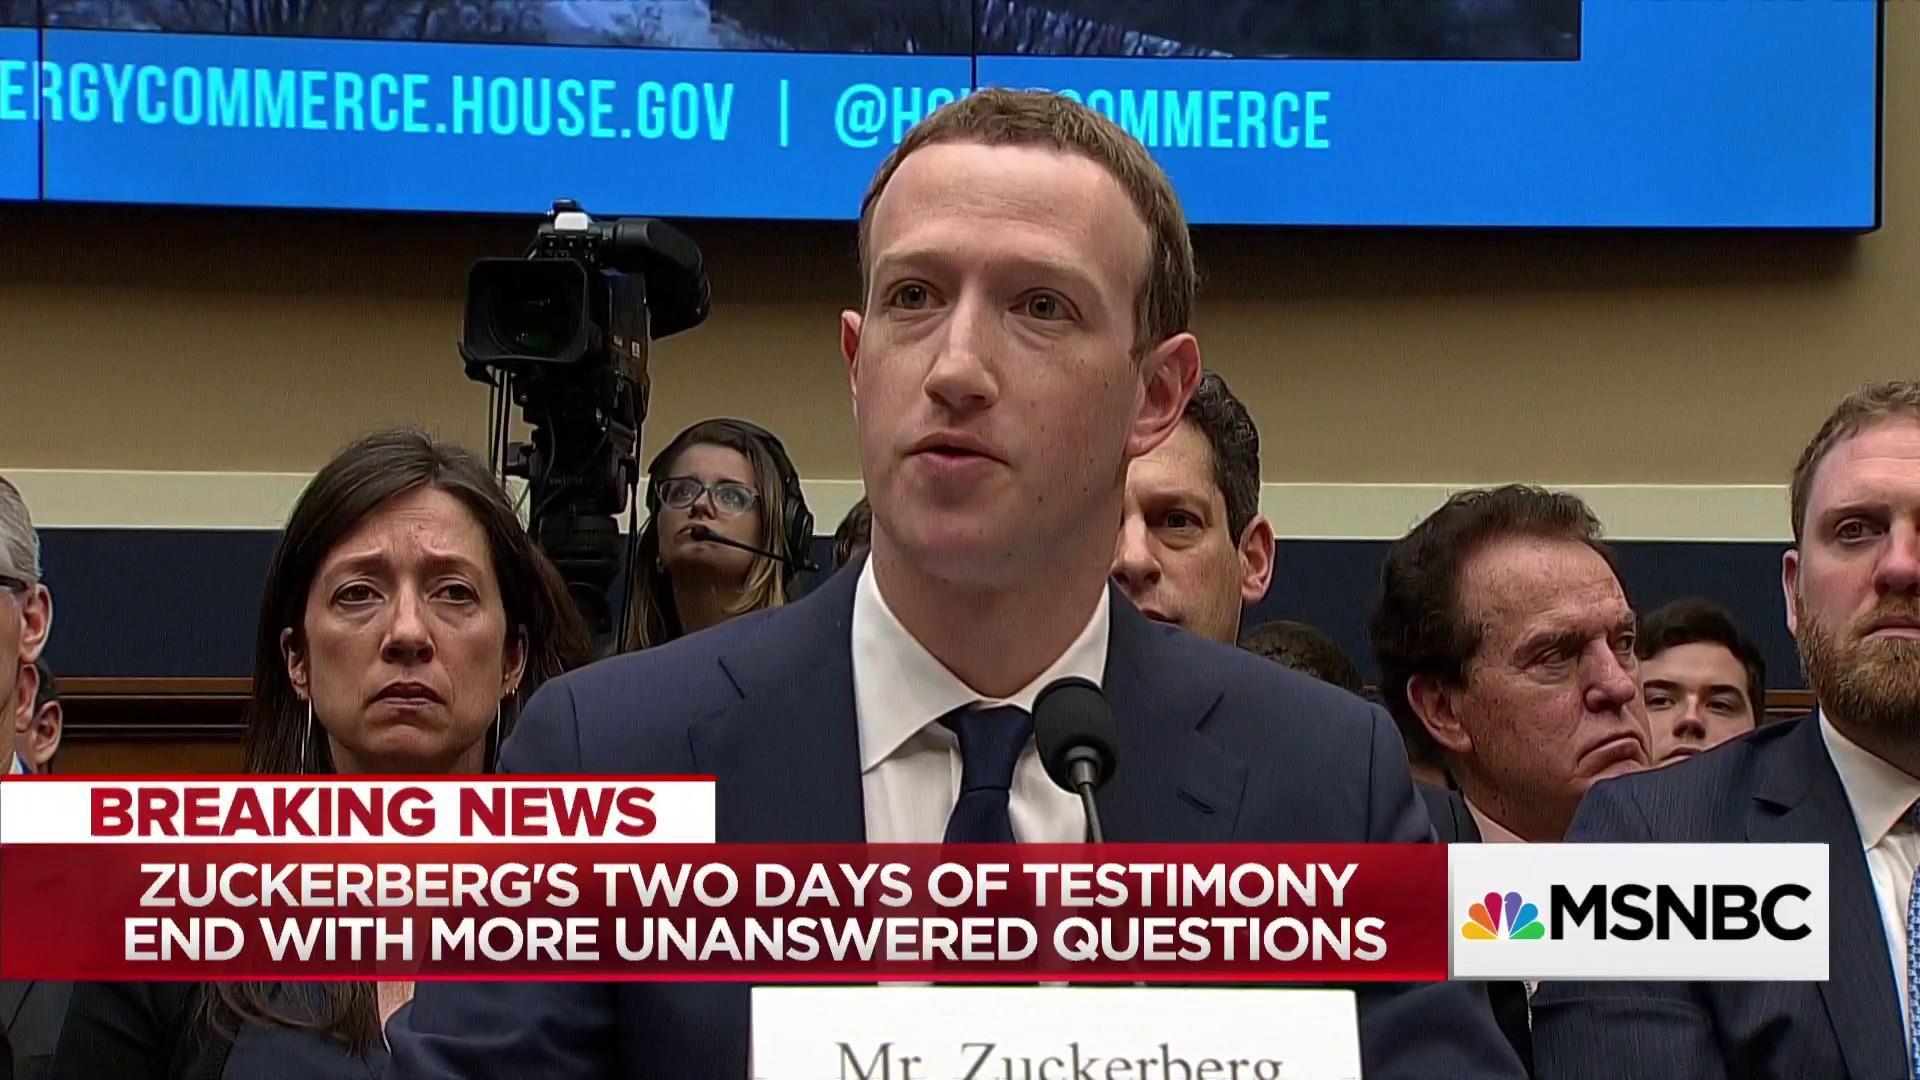 Ari Melber's two takeaways from Zuckerberg's testimony